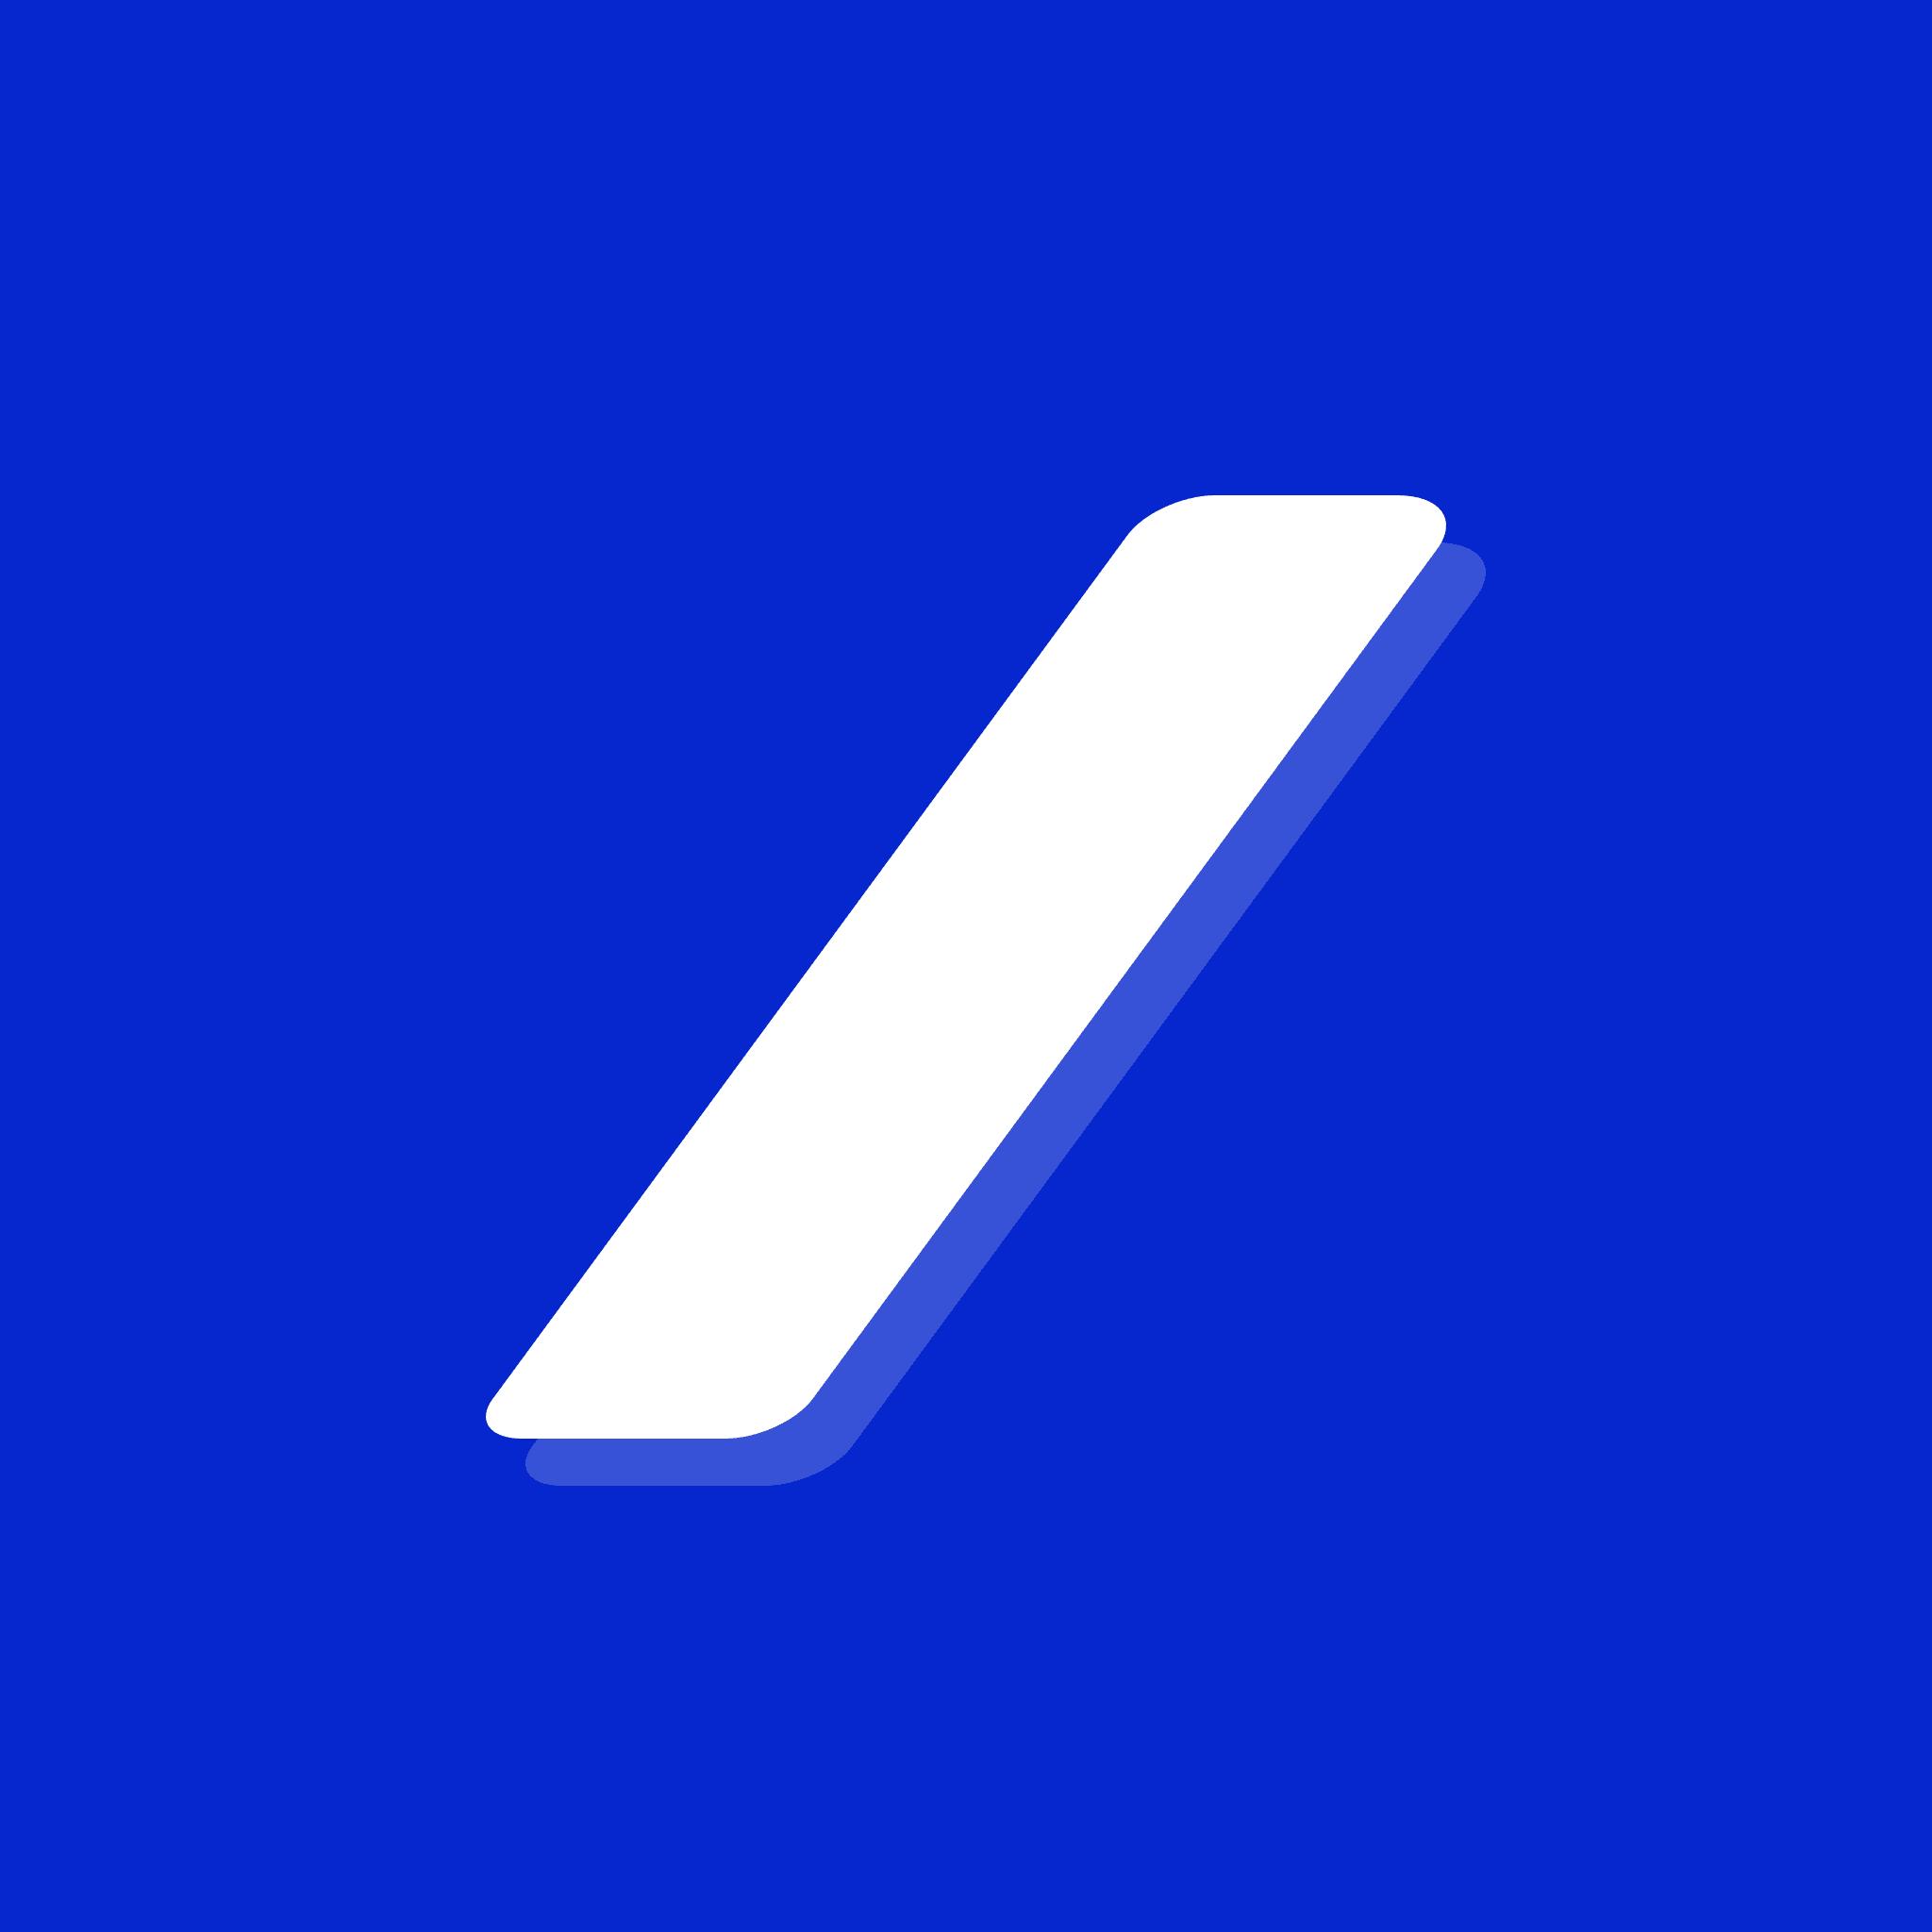 Innovat icon